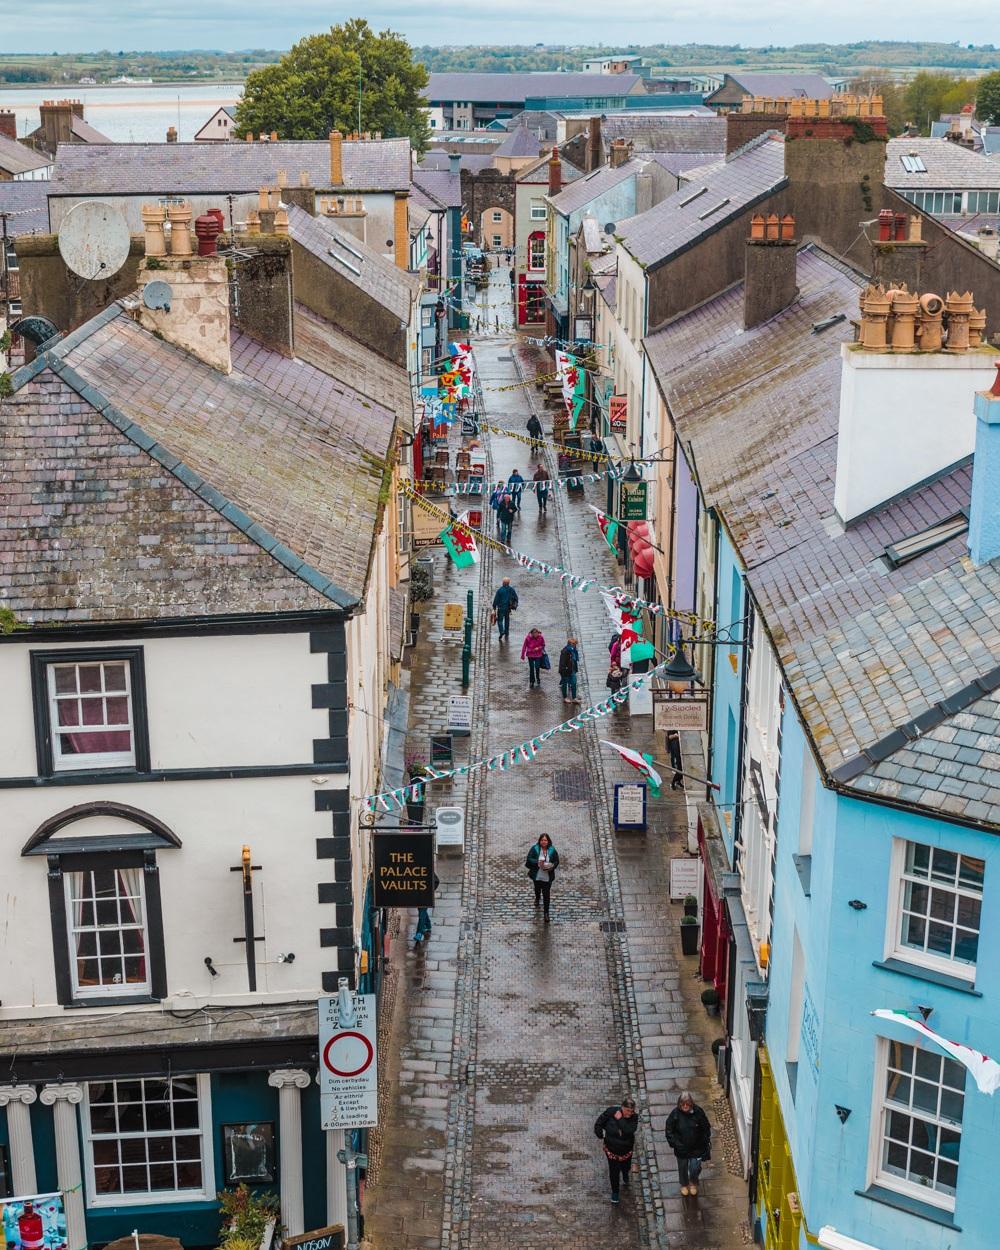 Caernarfon town // The Most Beautiful Places to Visit in Wales // #readysetjetset #wales #uk #welsh #travel #photospots #blogpost